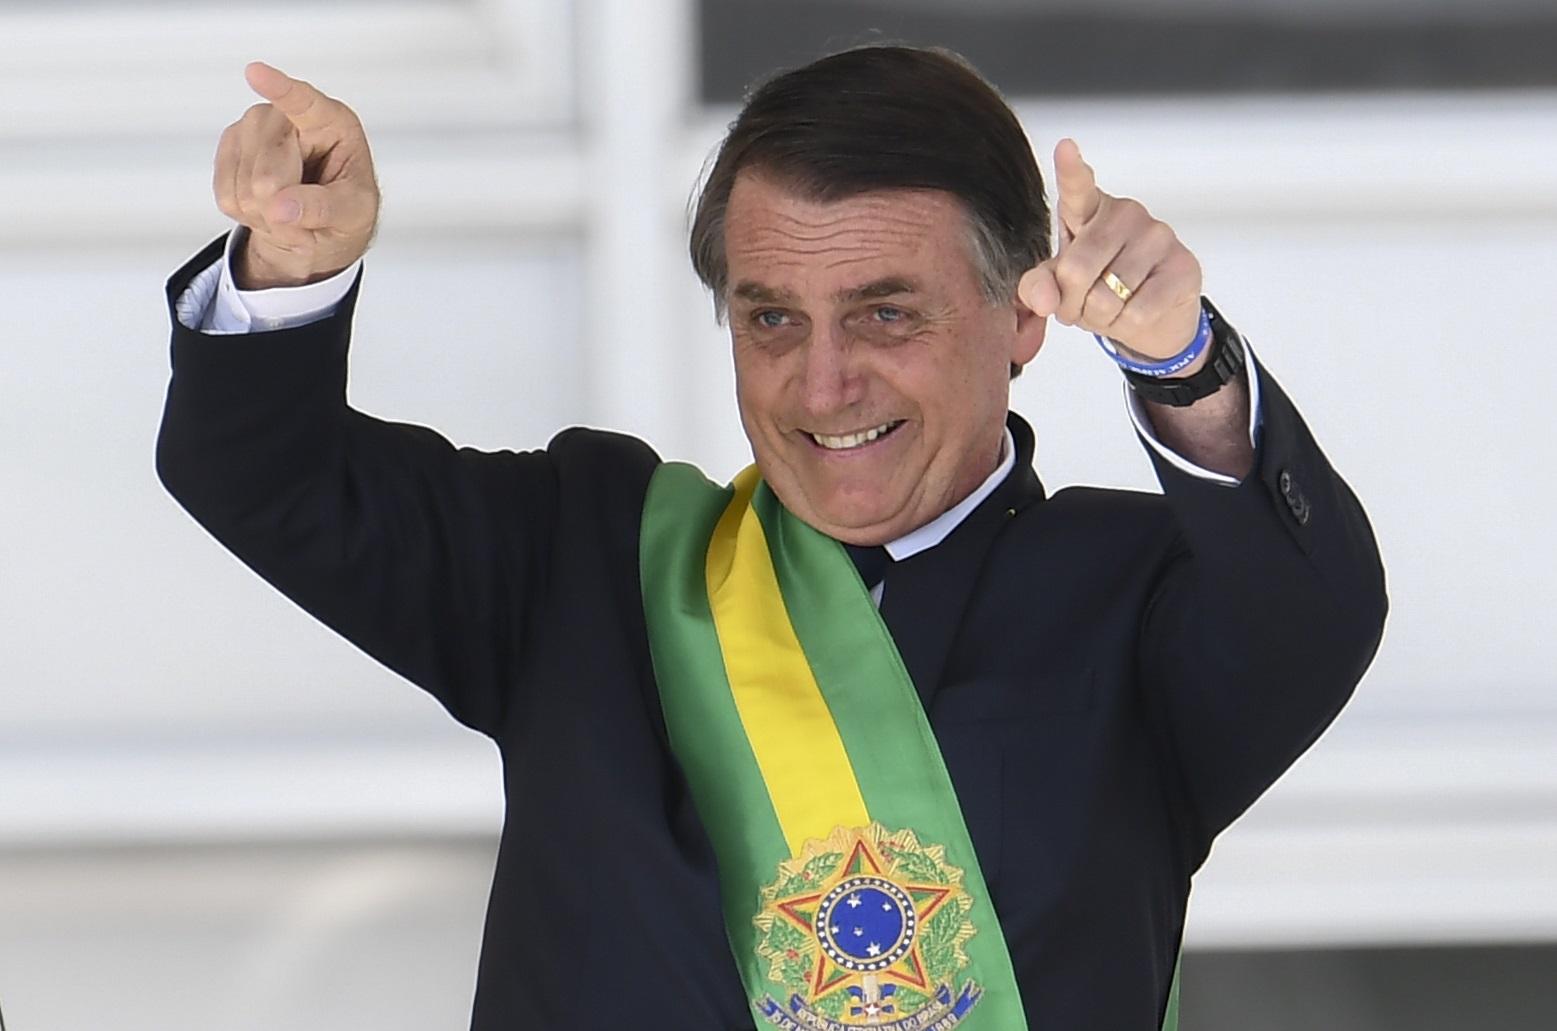 Jair Bolsonaro acena para o público após receber a faixa presidencial. Foto Evaristo Sá/AFP